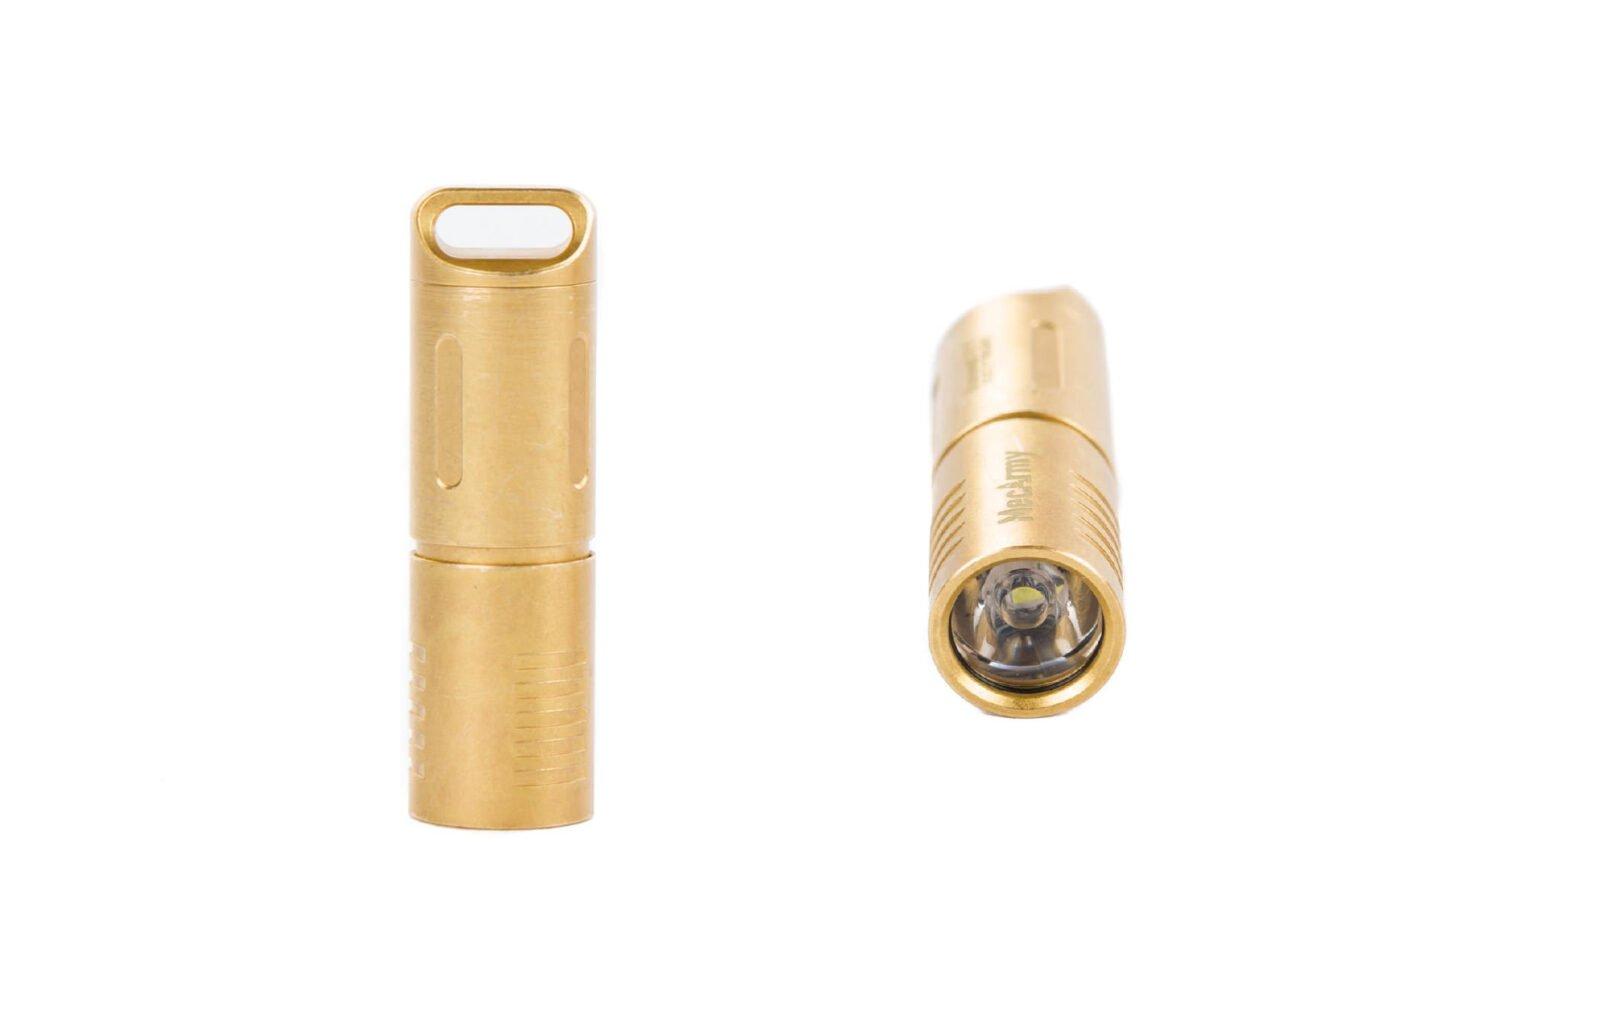 MecArmy Brass EDC Flashlight 1600x1027 - MecArmy Brass EDC Flashlight